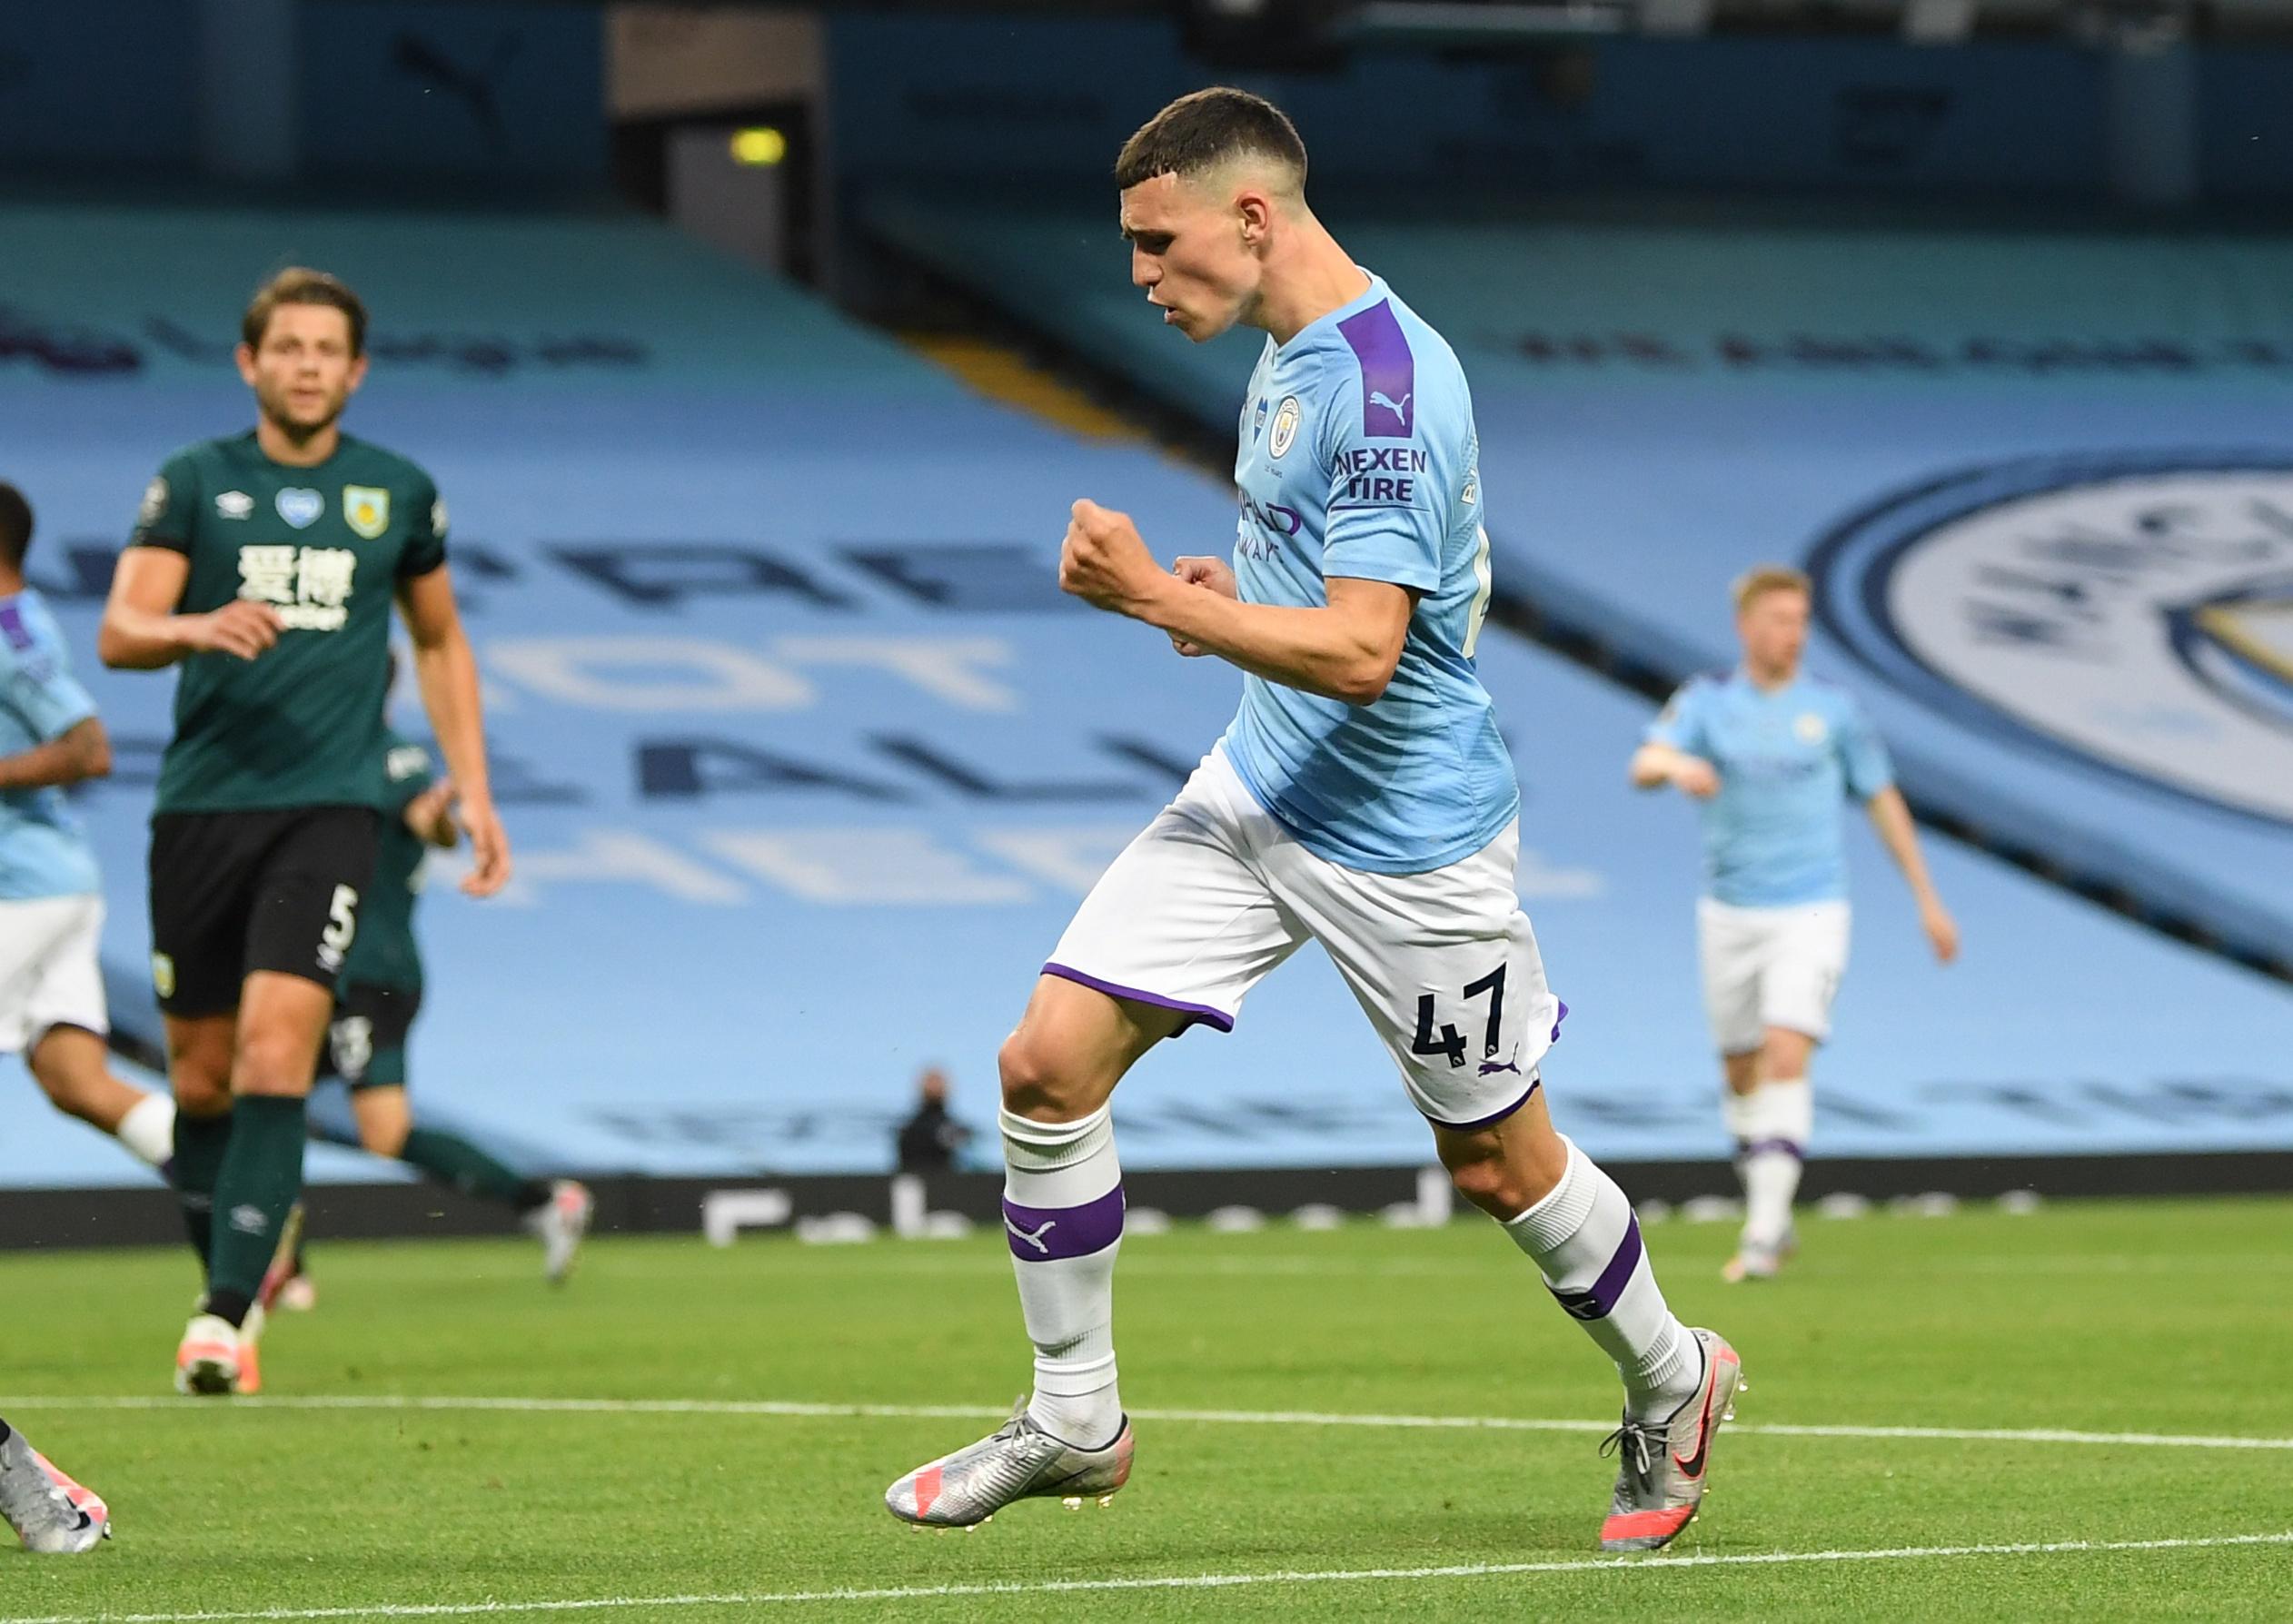 Foden starts for Man City as Guardiola benches Mahrez